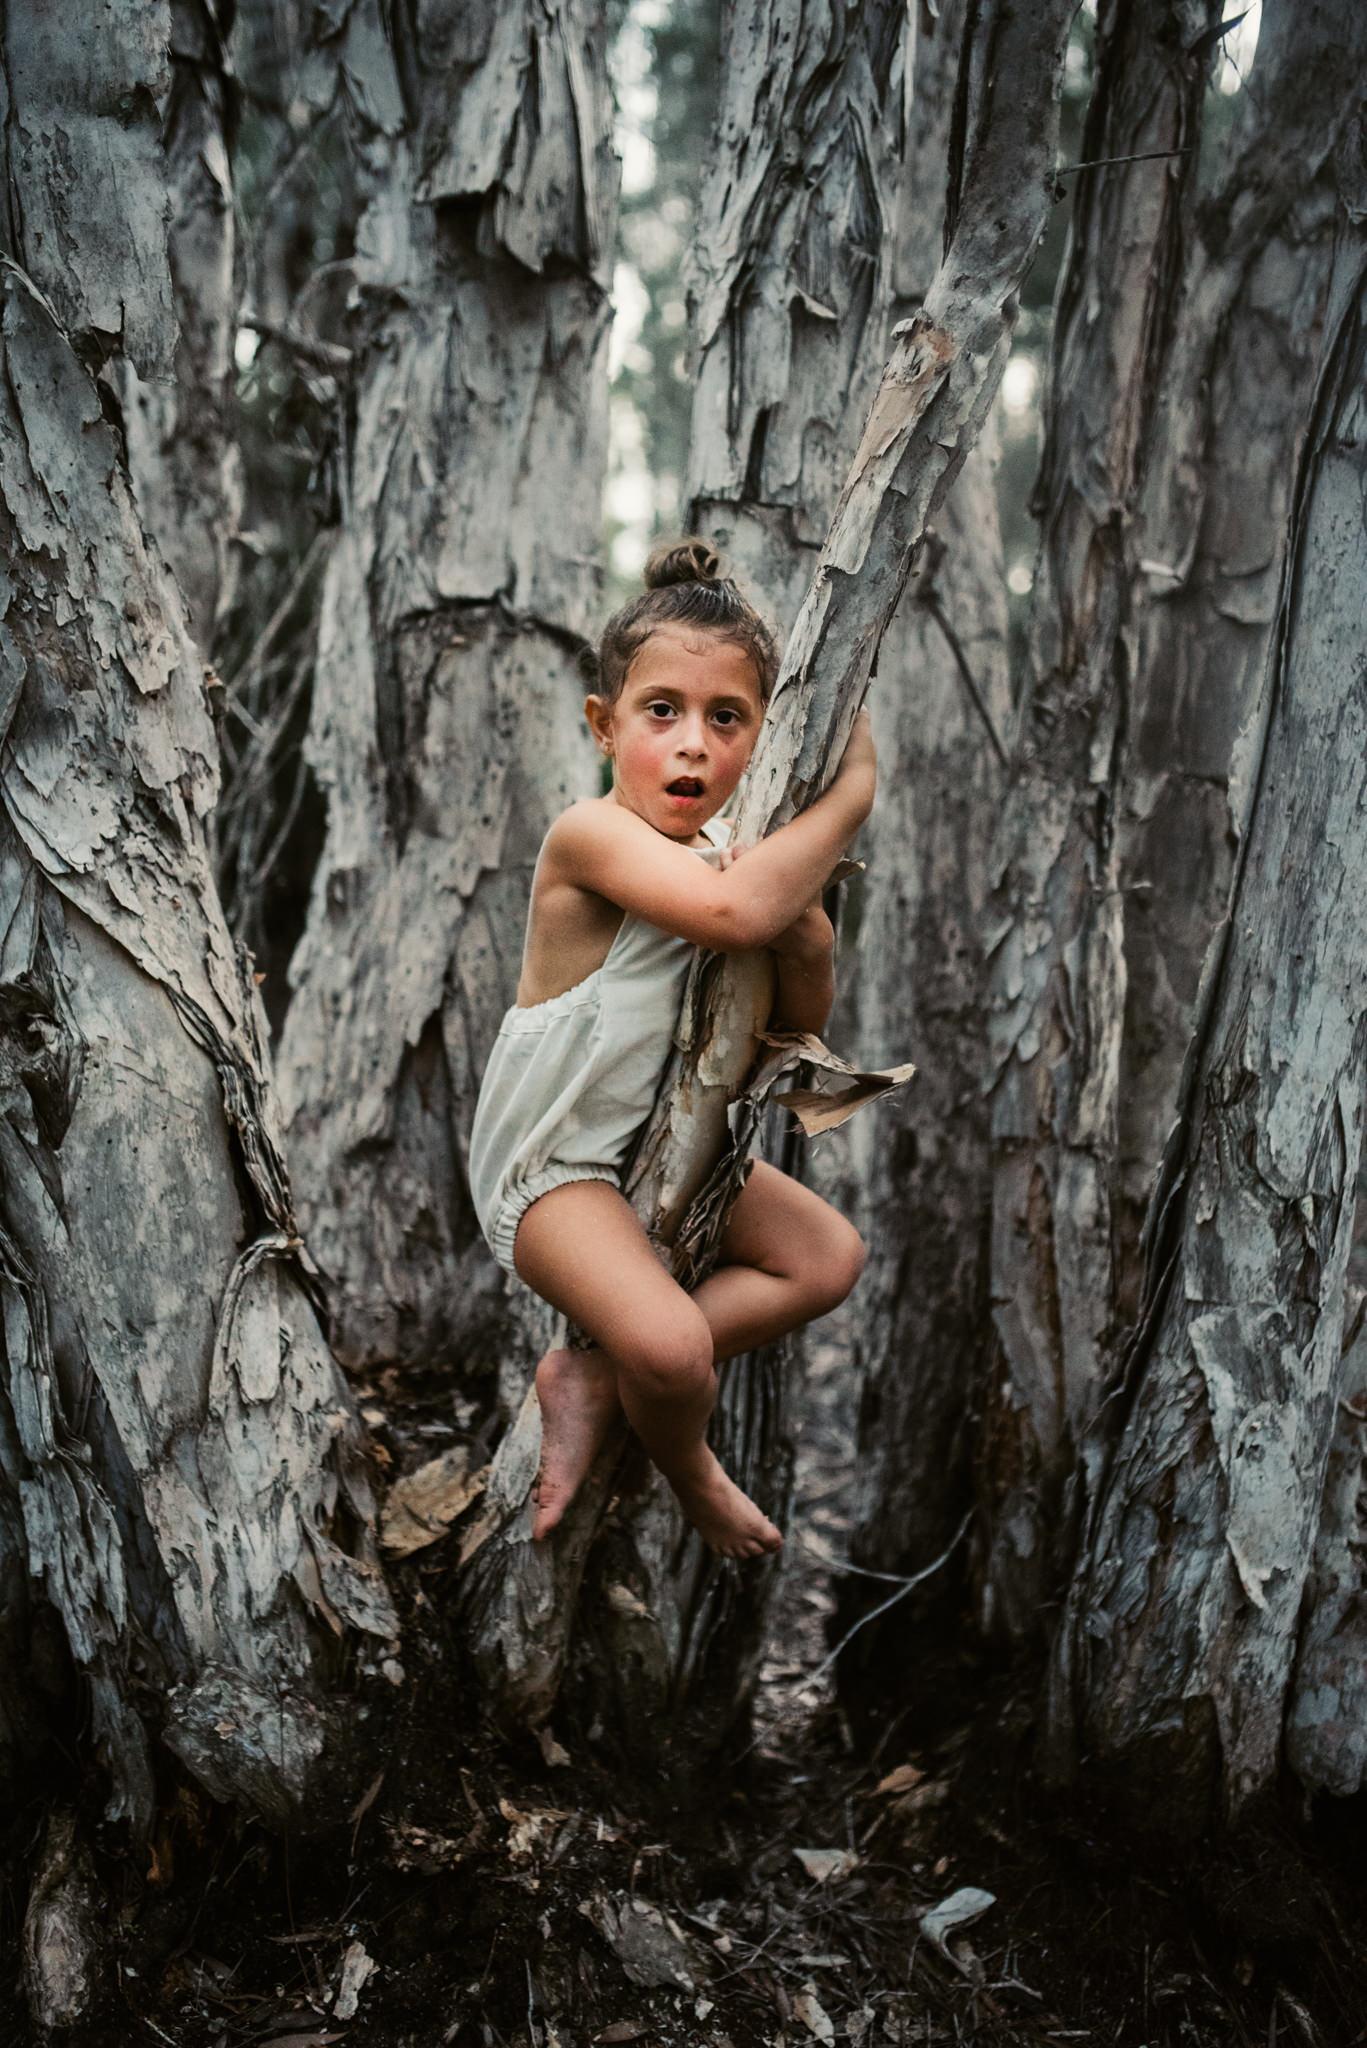 twyla jones photography - treasure coast florida - childrens adventure clothing commercial shoot--53.jpg